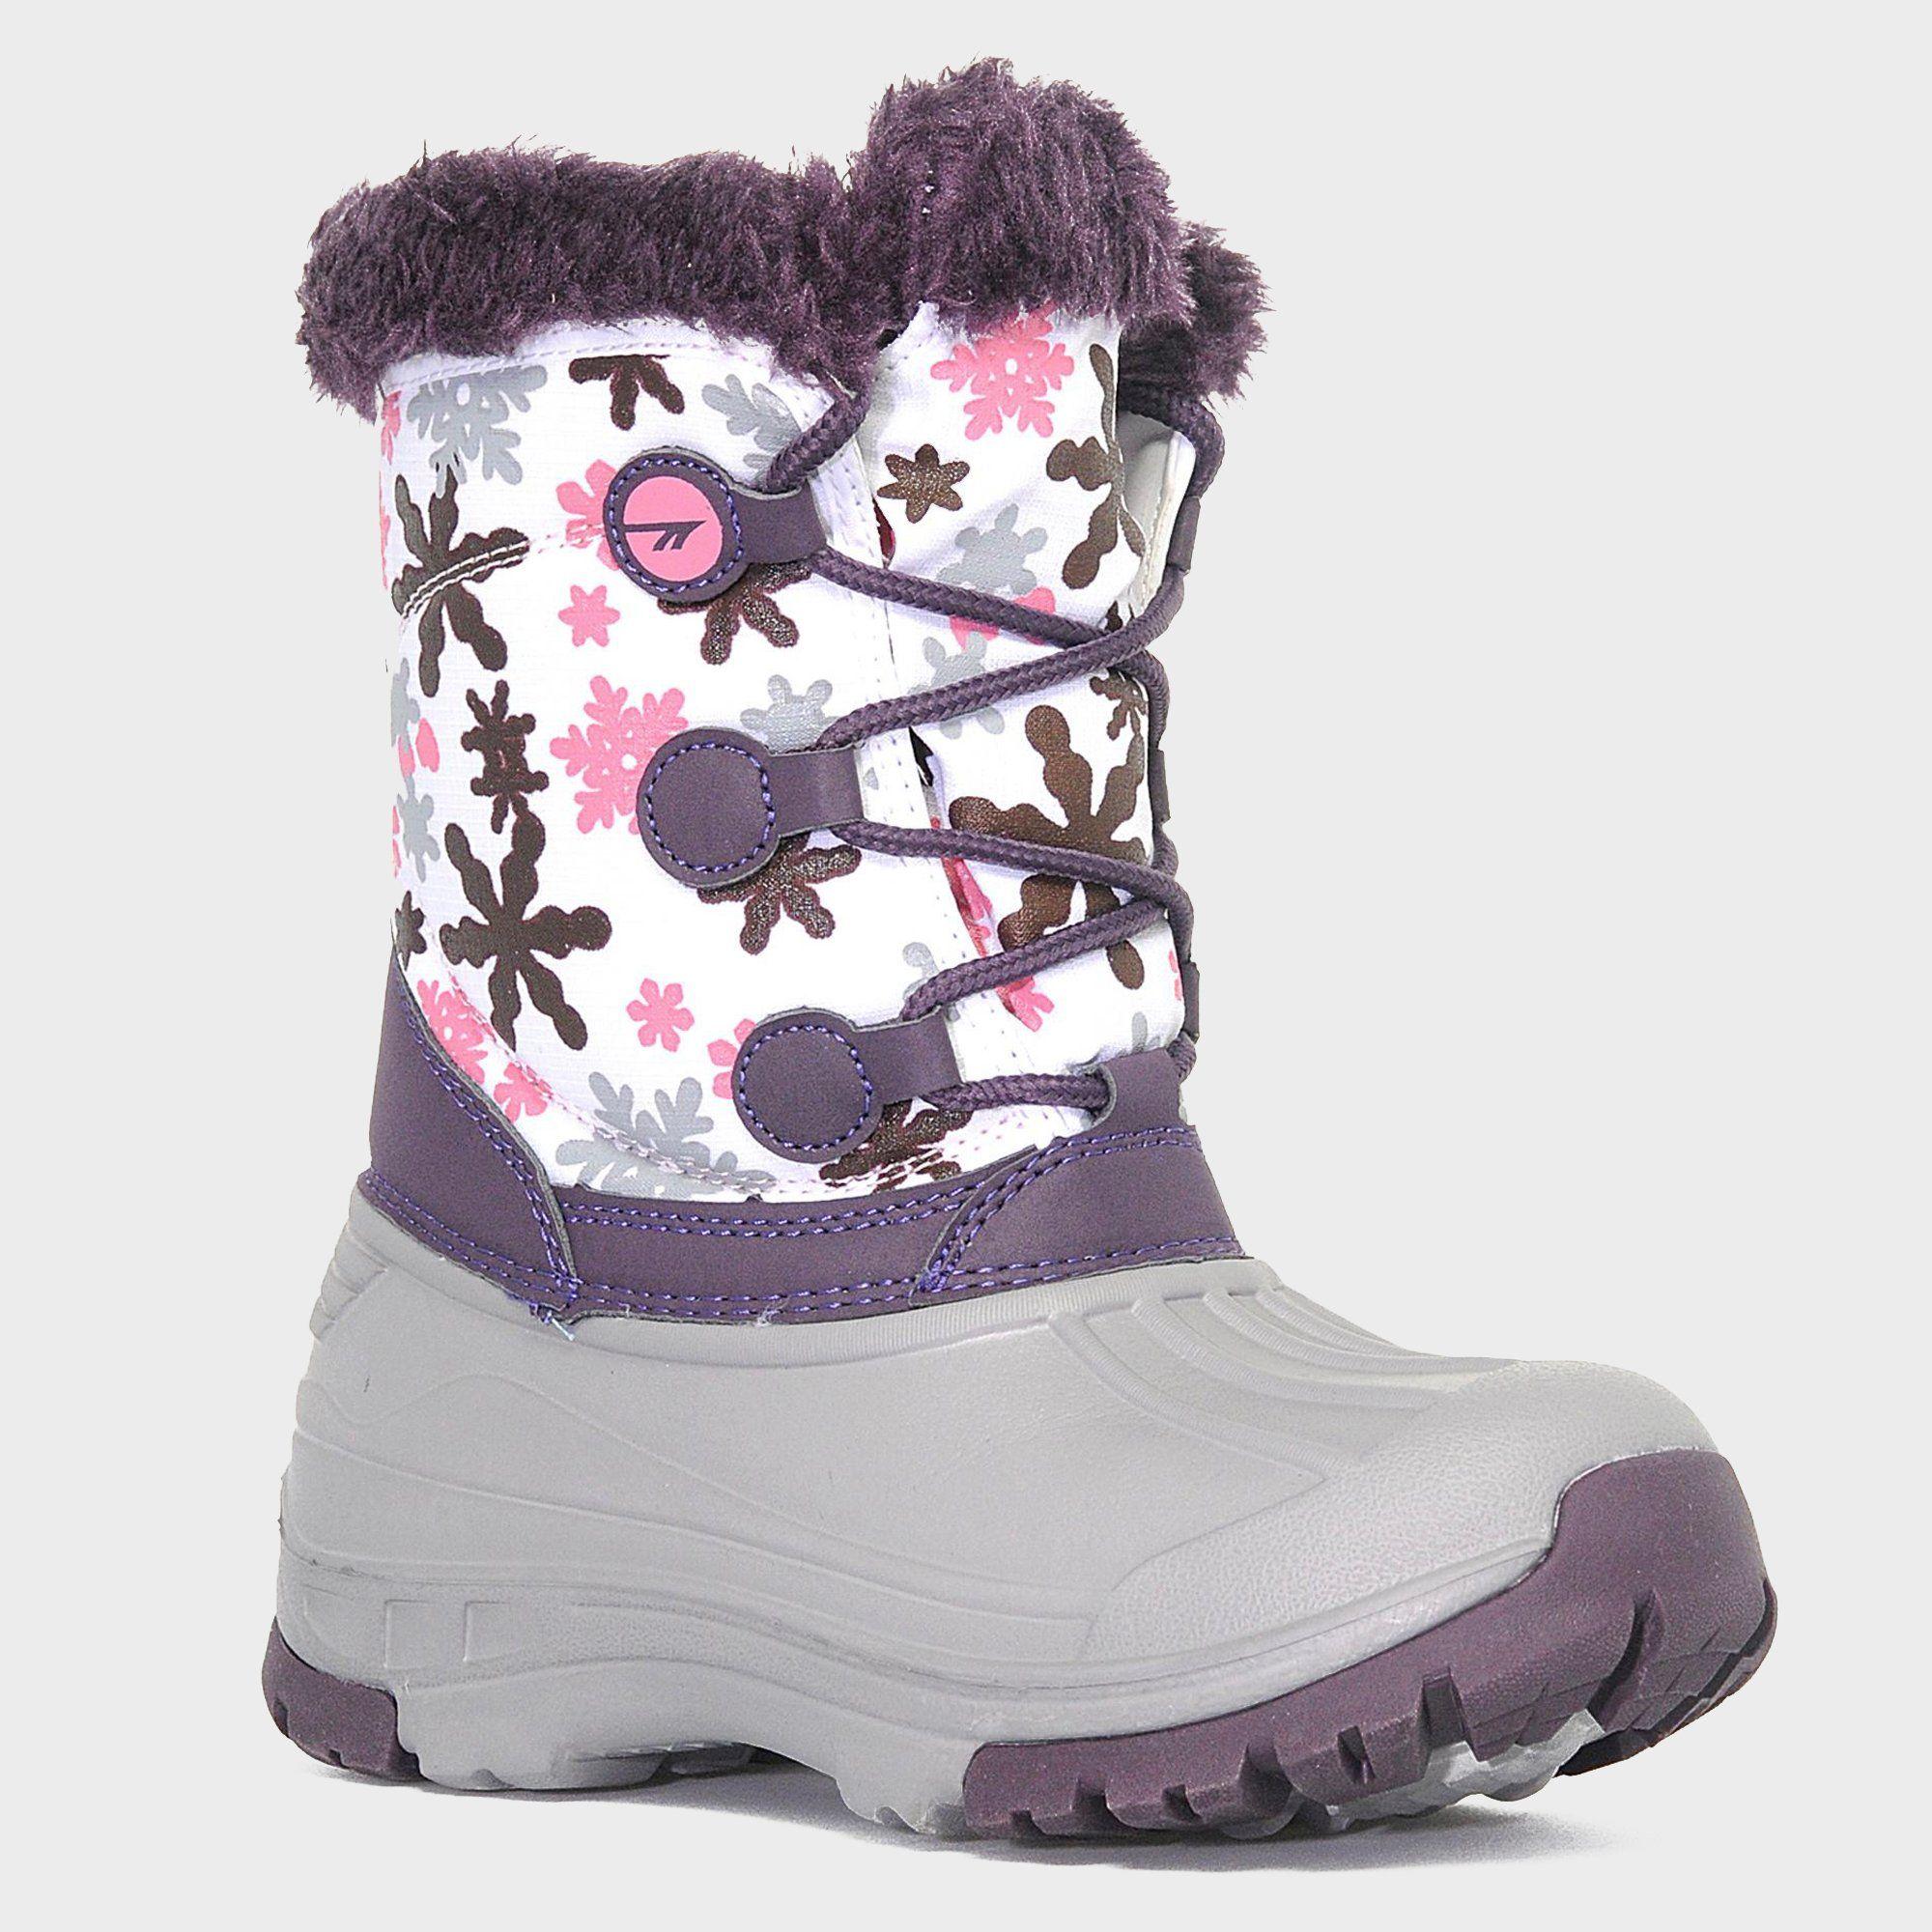 HI TEC Girls' Cornice Snow Boots